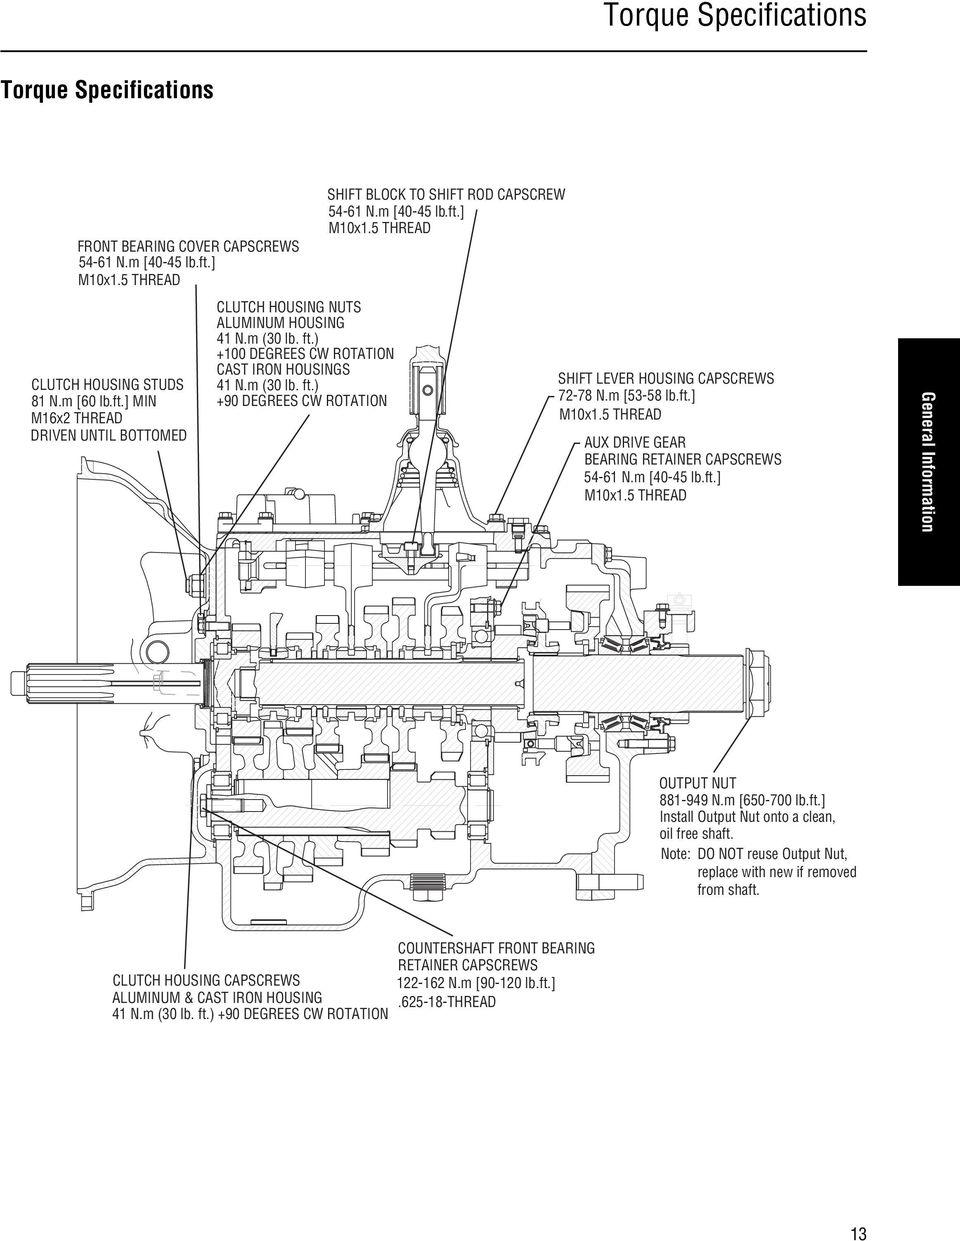 medium resolution of 5 thread shift lever housing capscrews 72 78 n m 53 58 lb